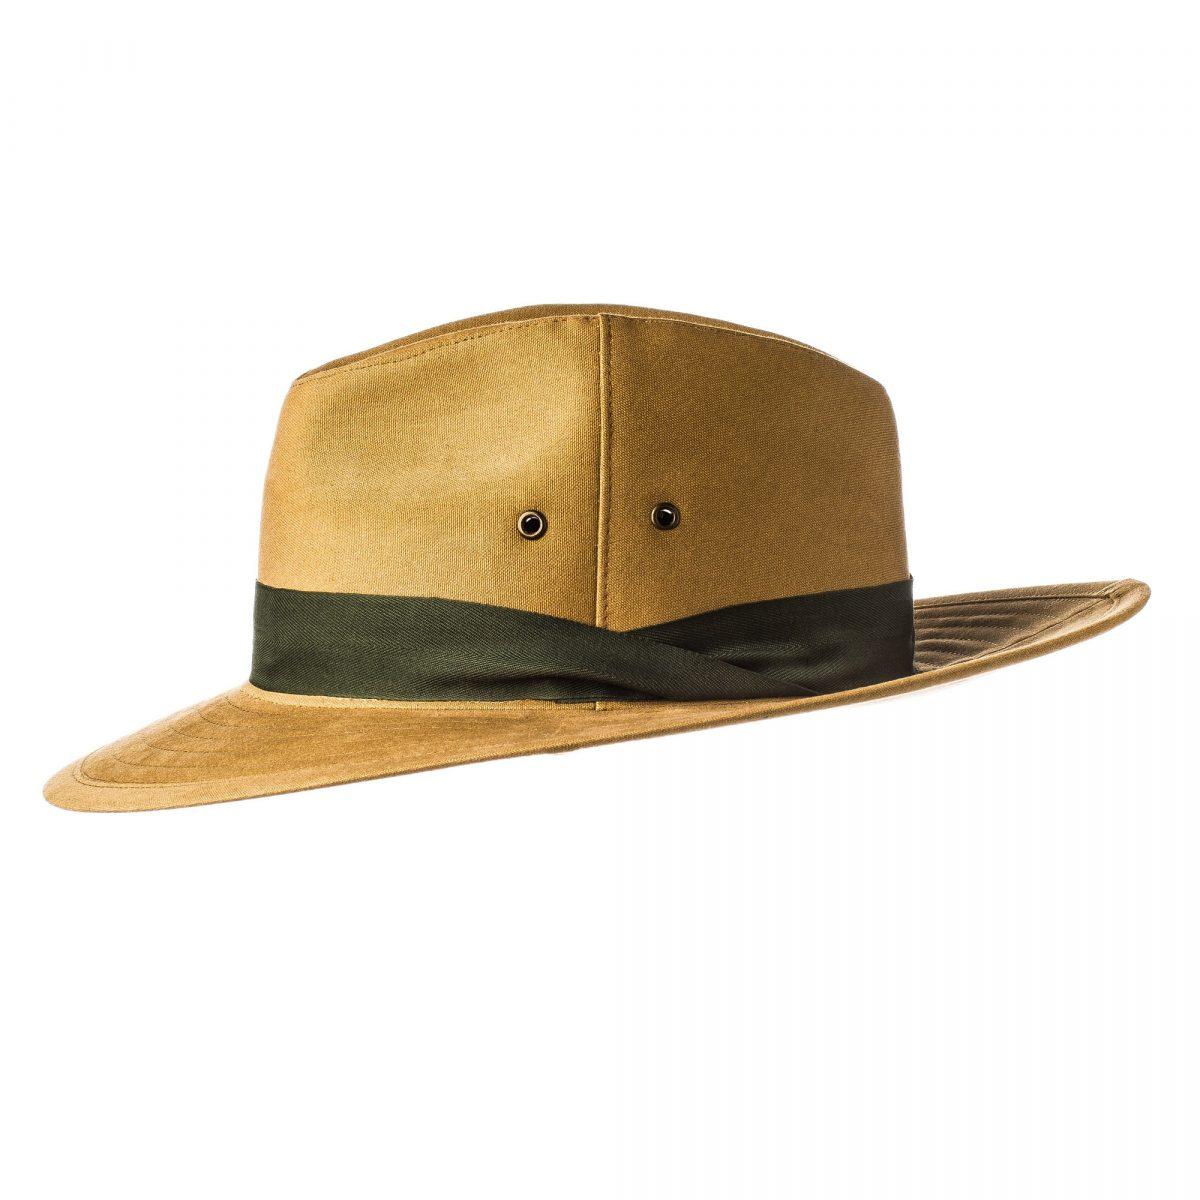 wr_co_safari_hat-2087-edit